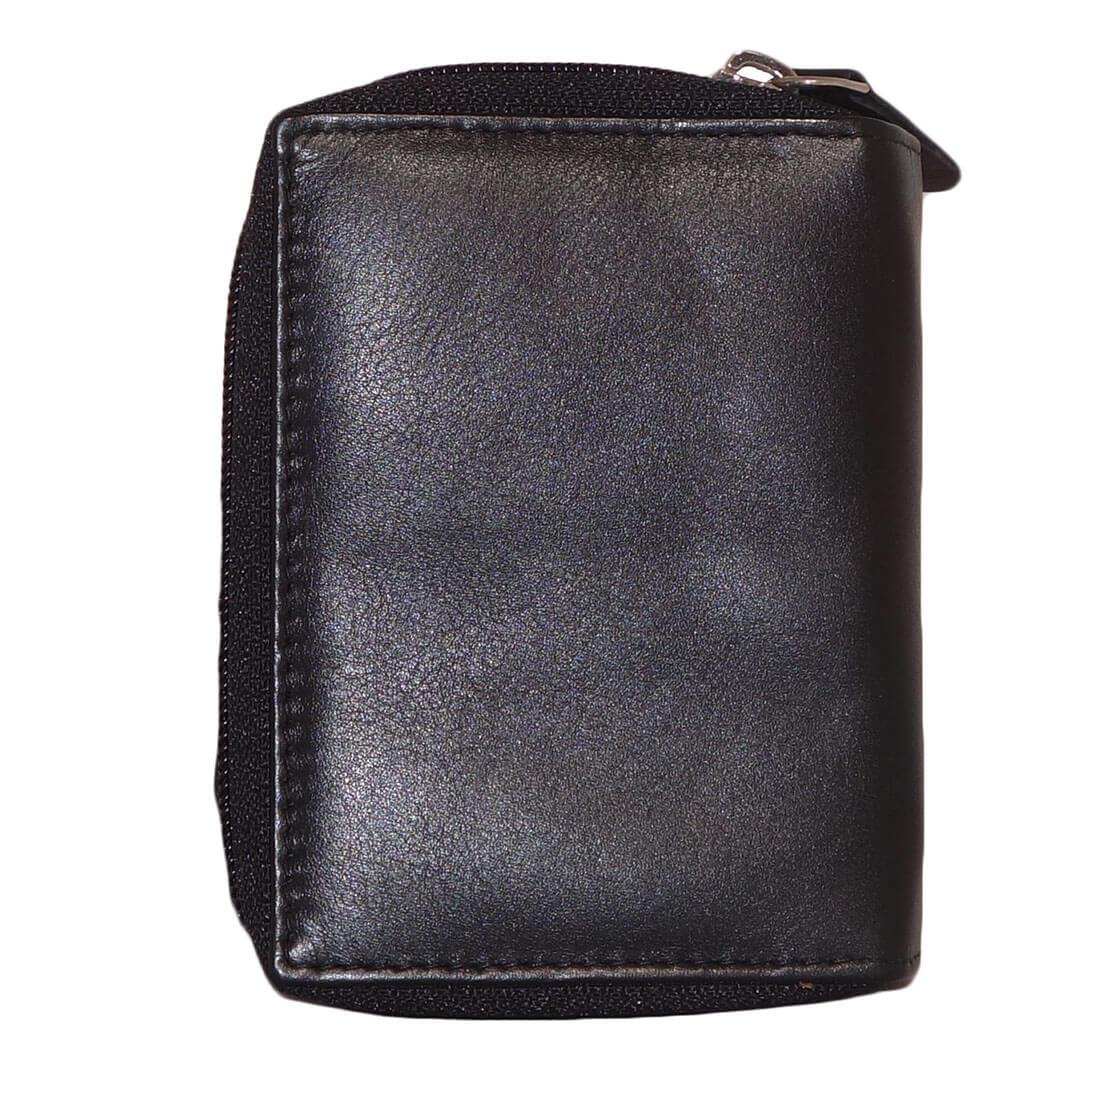 e97cfa8ff68 Leather Design Portemonnee met Secrid Cardprotector Vak en Ritsvak  Zwart-15244 ...